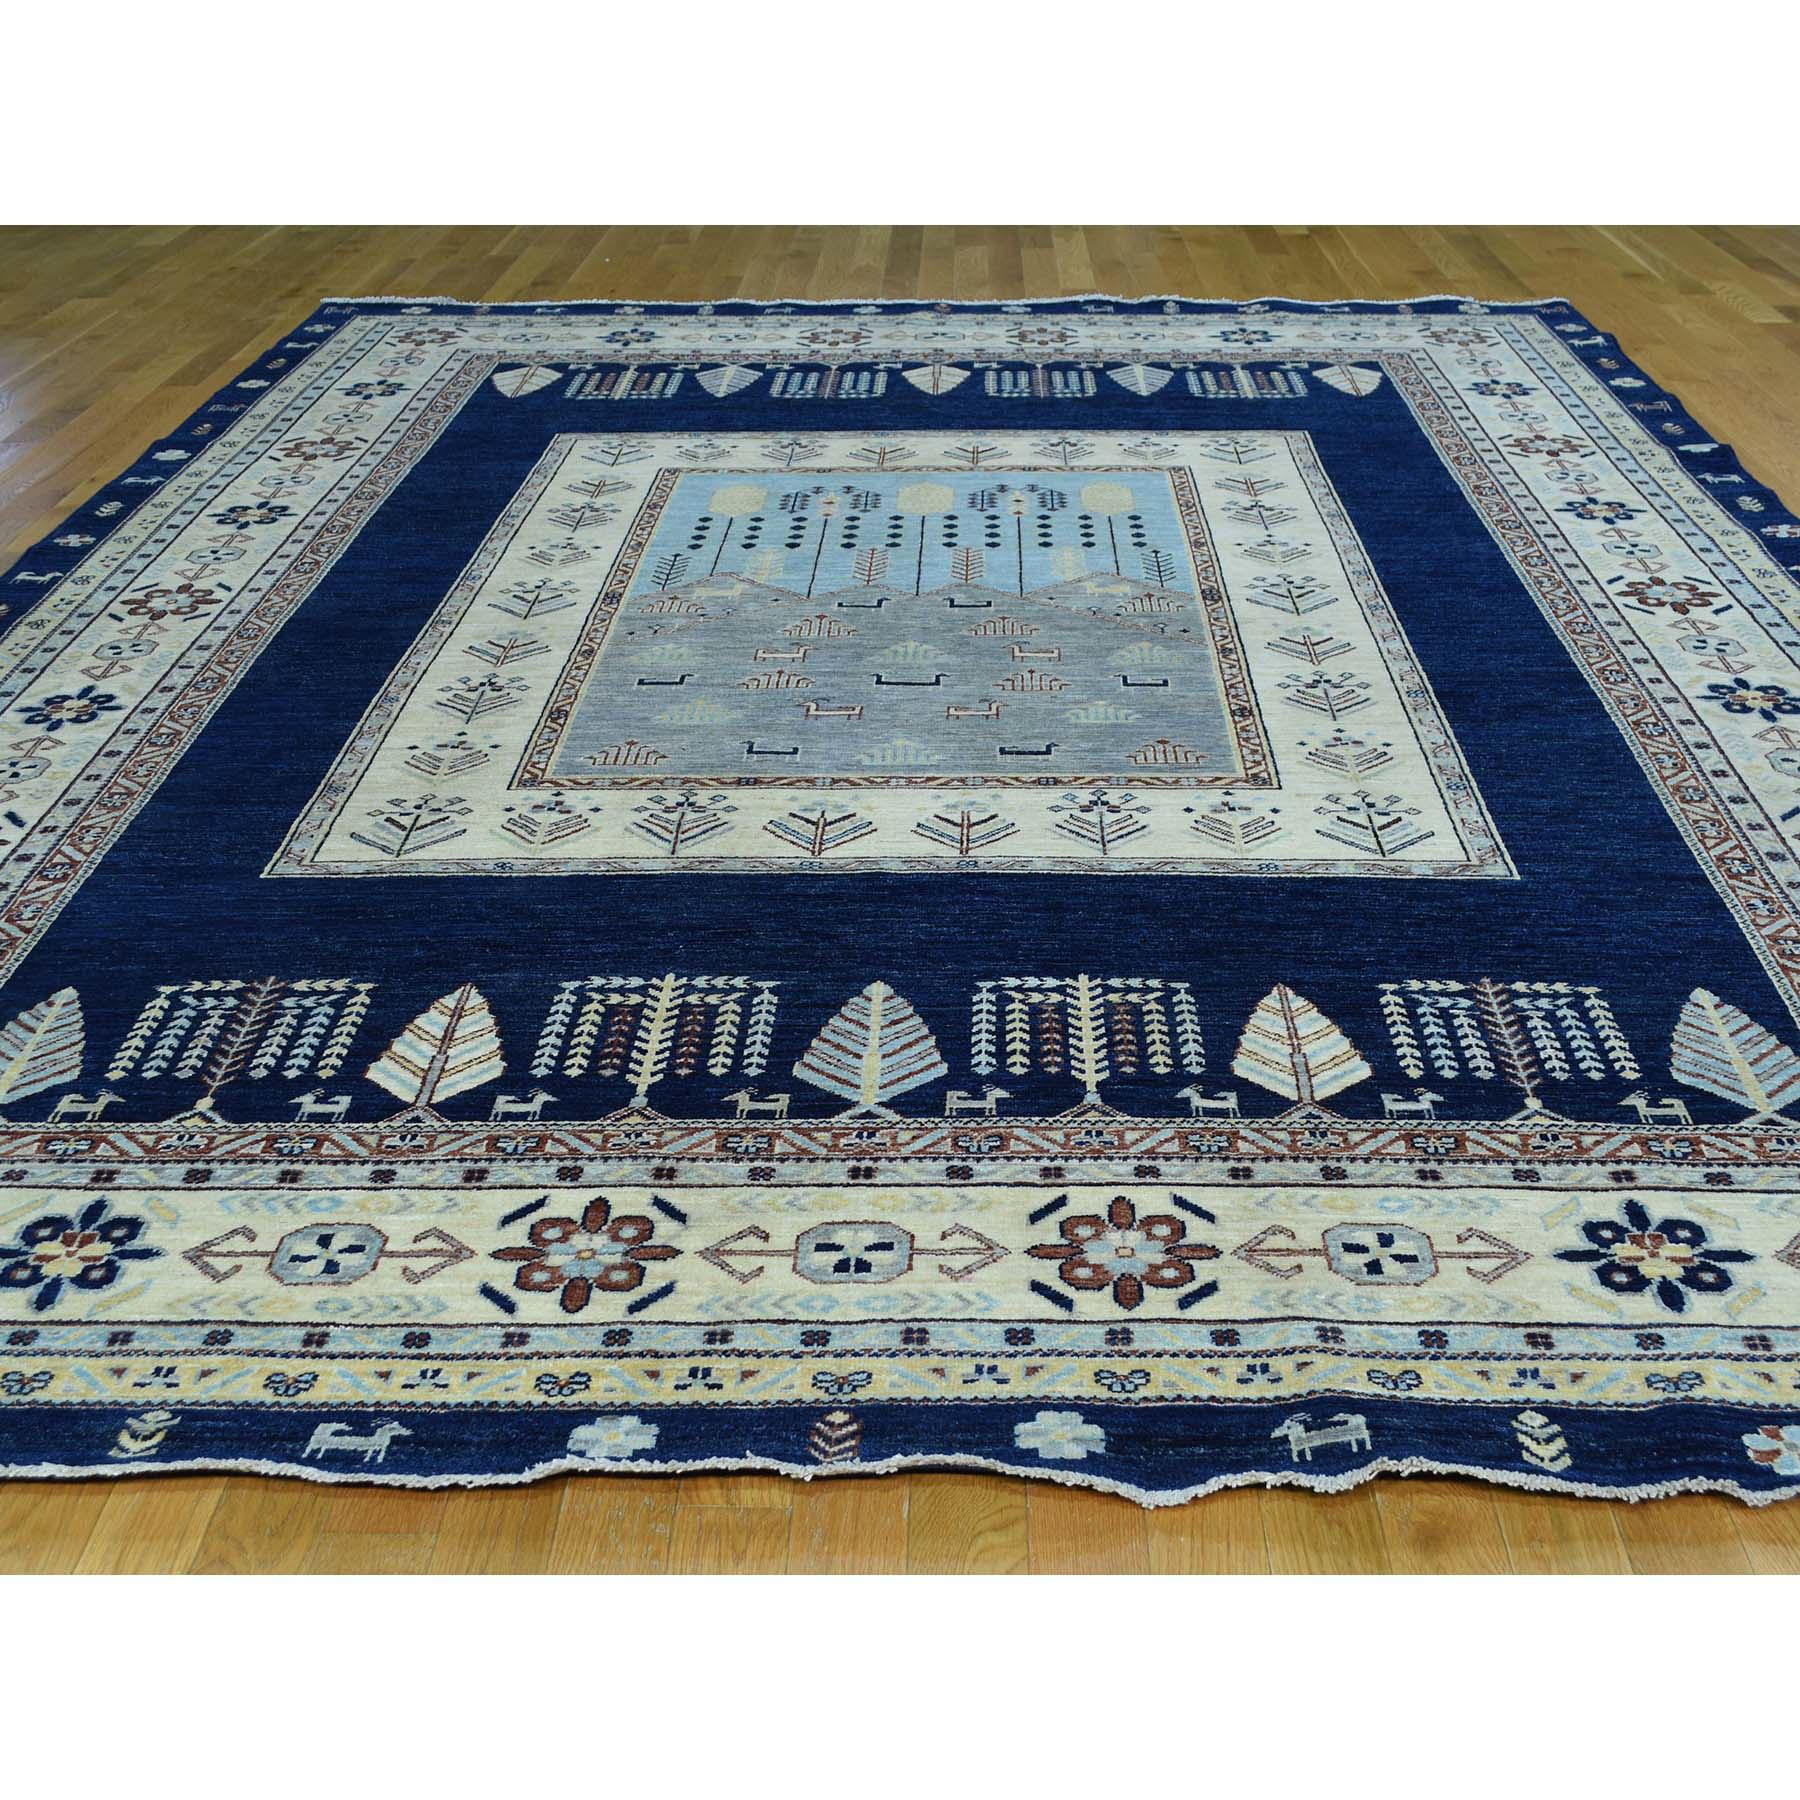 "9'3""x12'2"" Handmade Pure Wool Arts And Crafts Scenery Design Peshawar Rug"